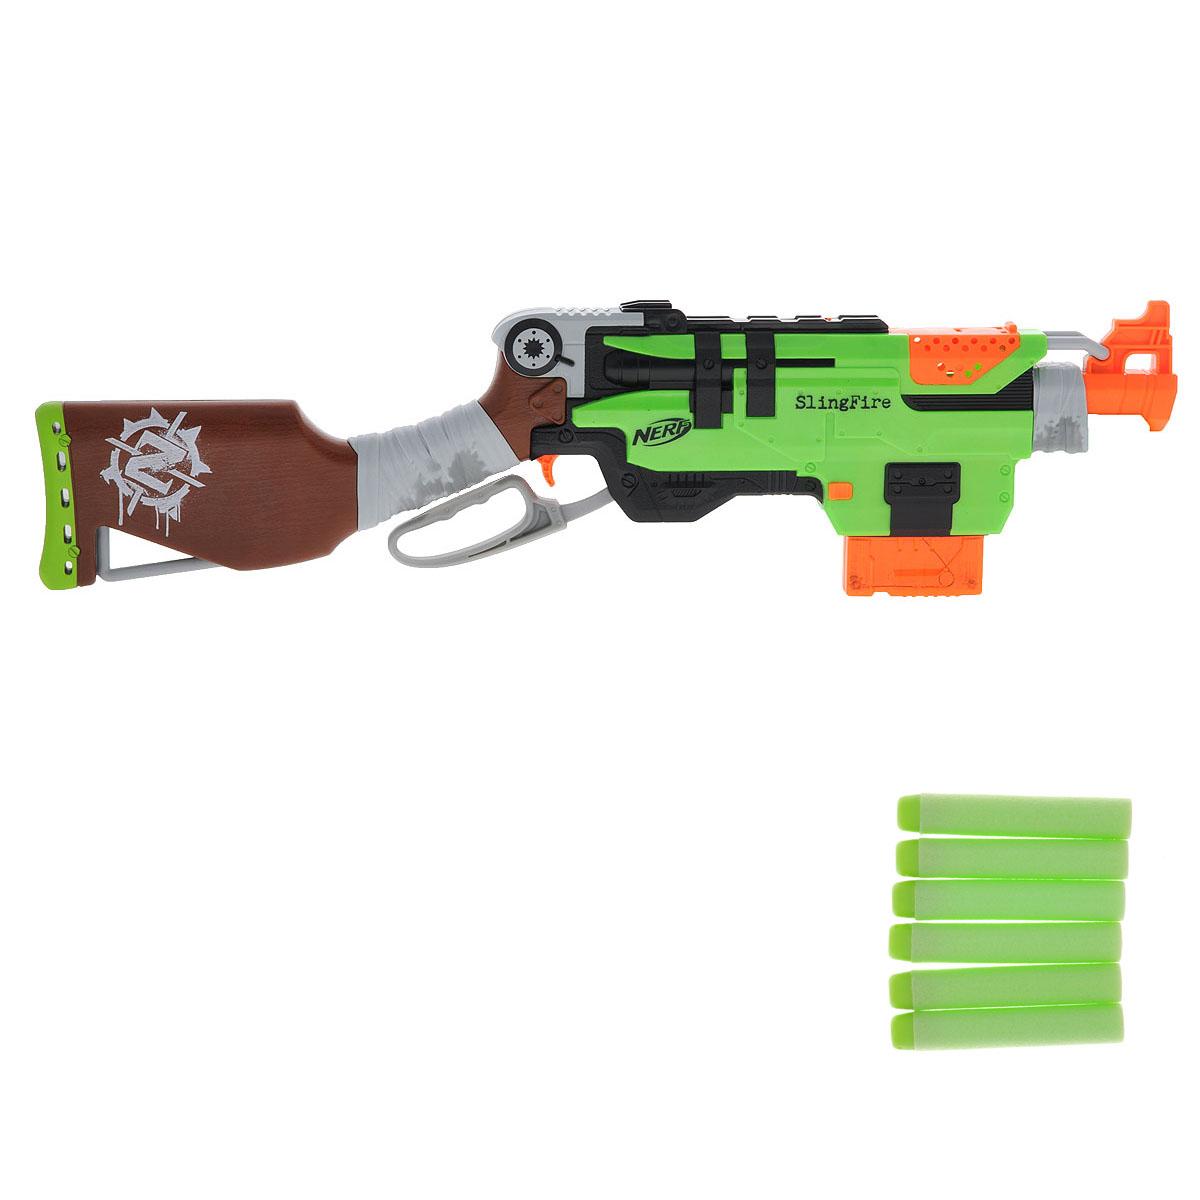 Nerf Бластер Zombie Strike: Slingfire с патронами цвет салатовый коричневый оранжевый nerf бластер zombie strike slingfire с патронами цвет салатовый коричневый оранжевый